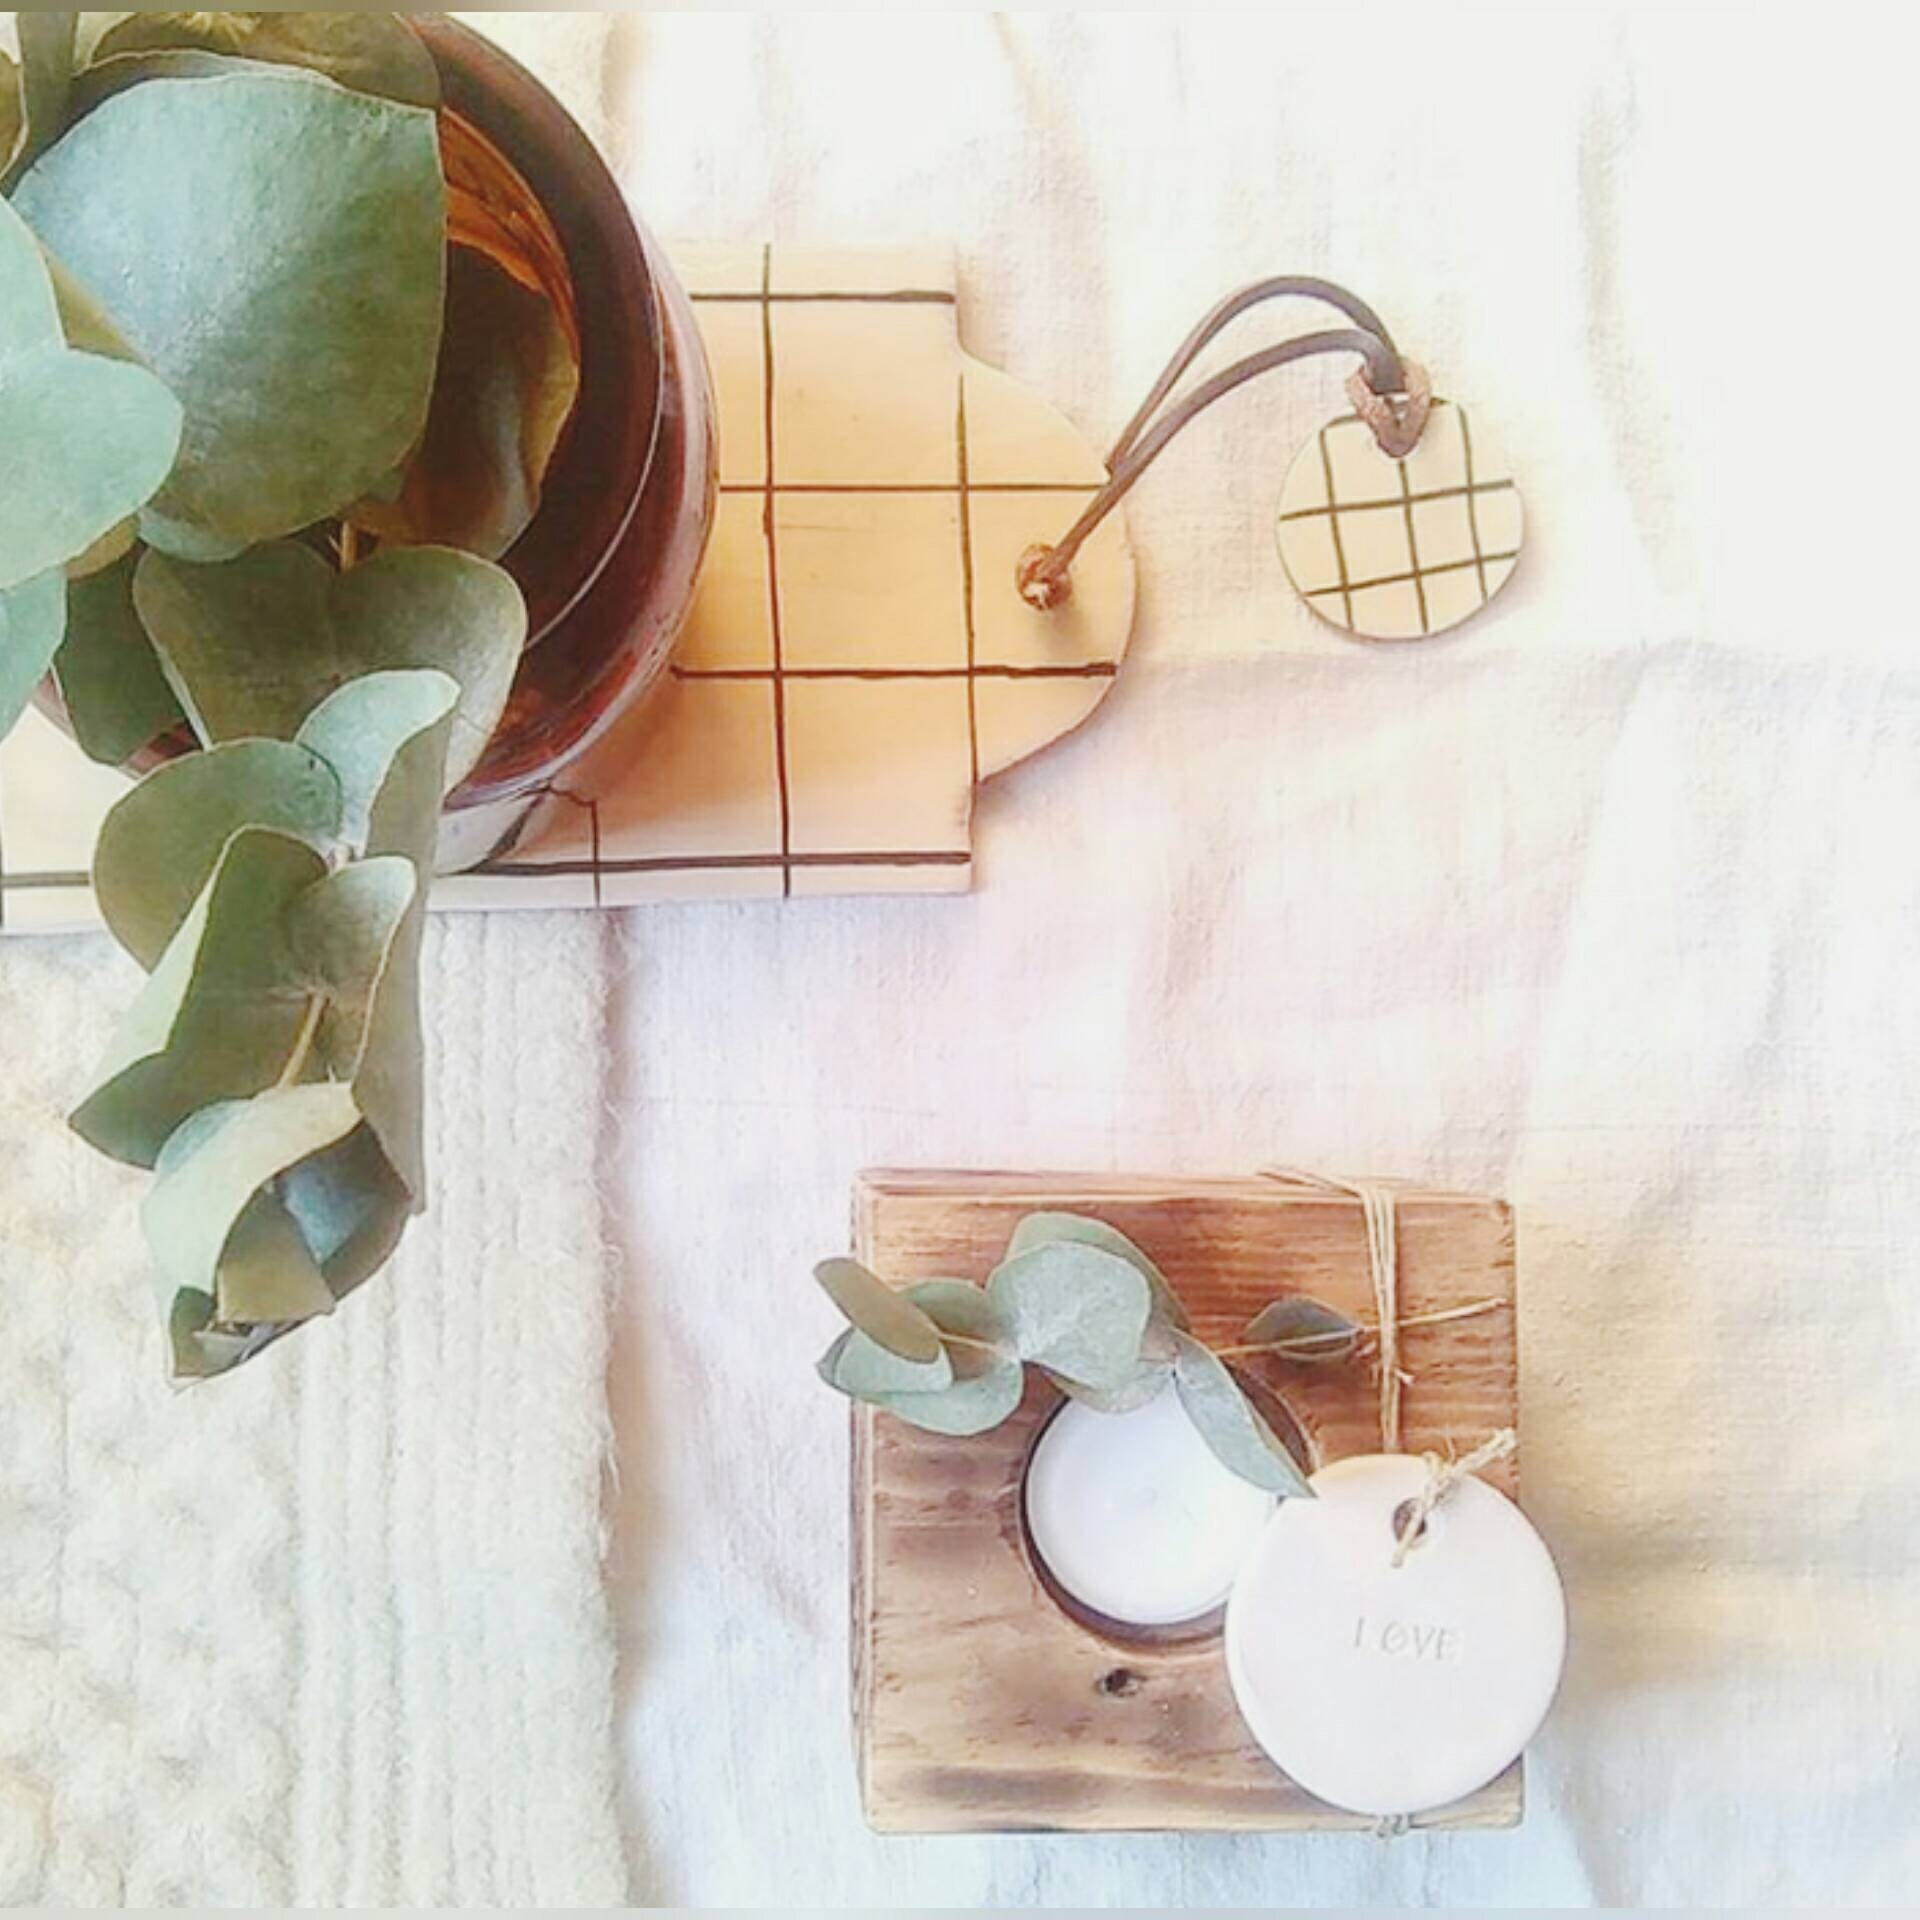 Cutting Board Ceramic Tiles Grid White Black Scandinavian Minimalist - Ceramic tile cutting boards